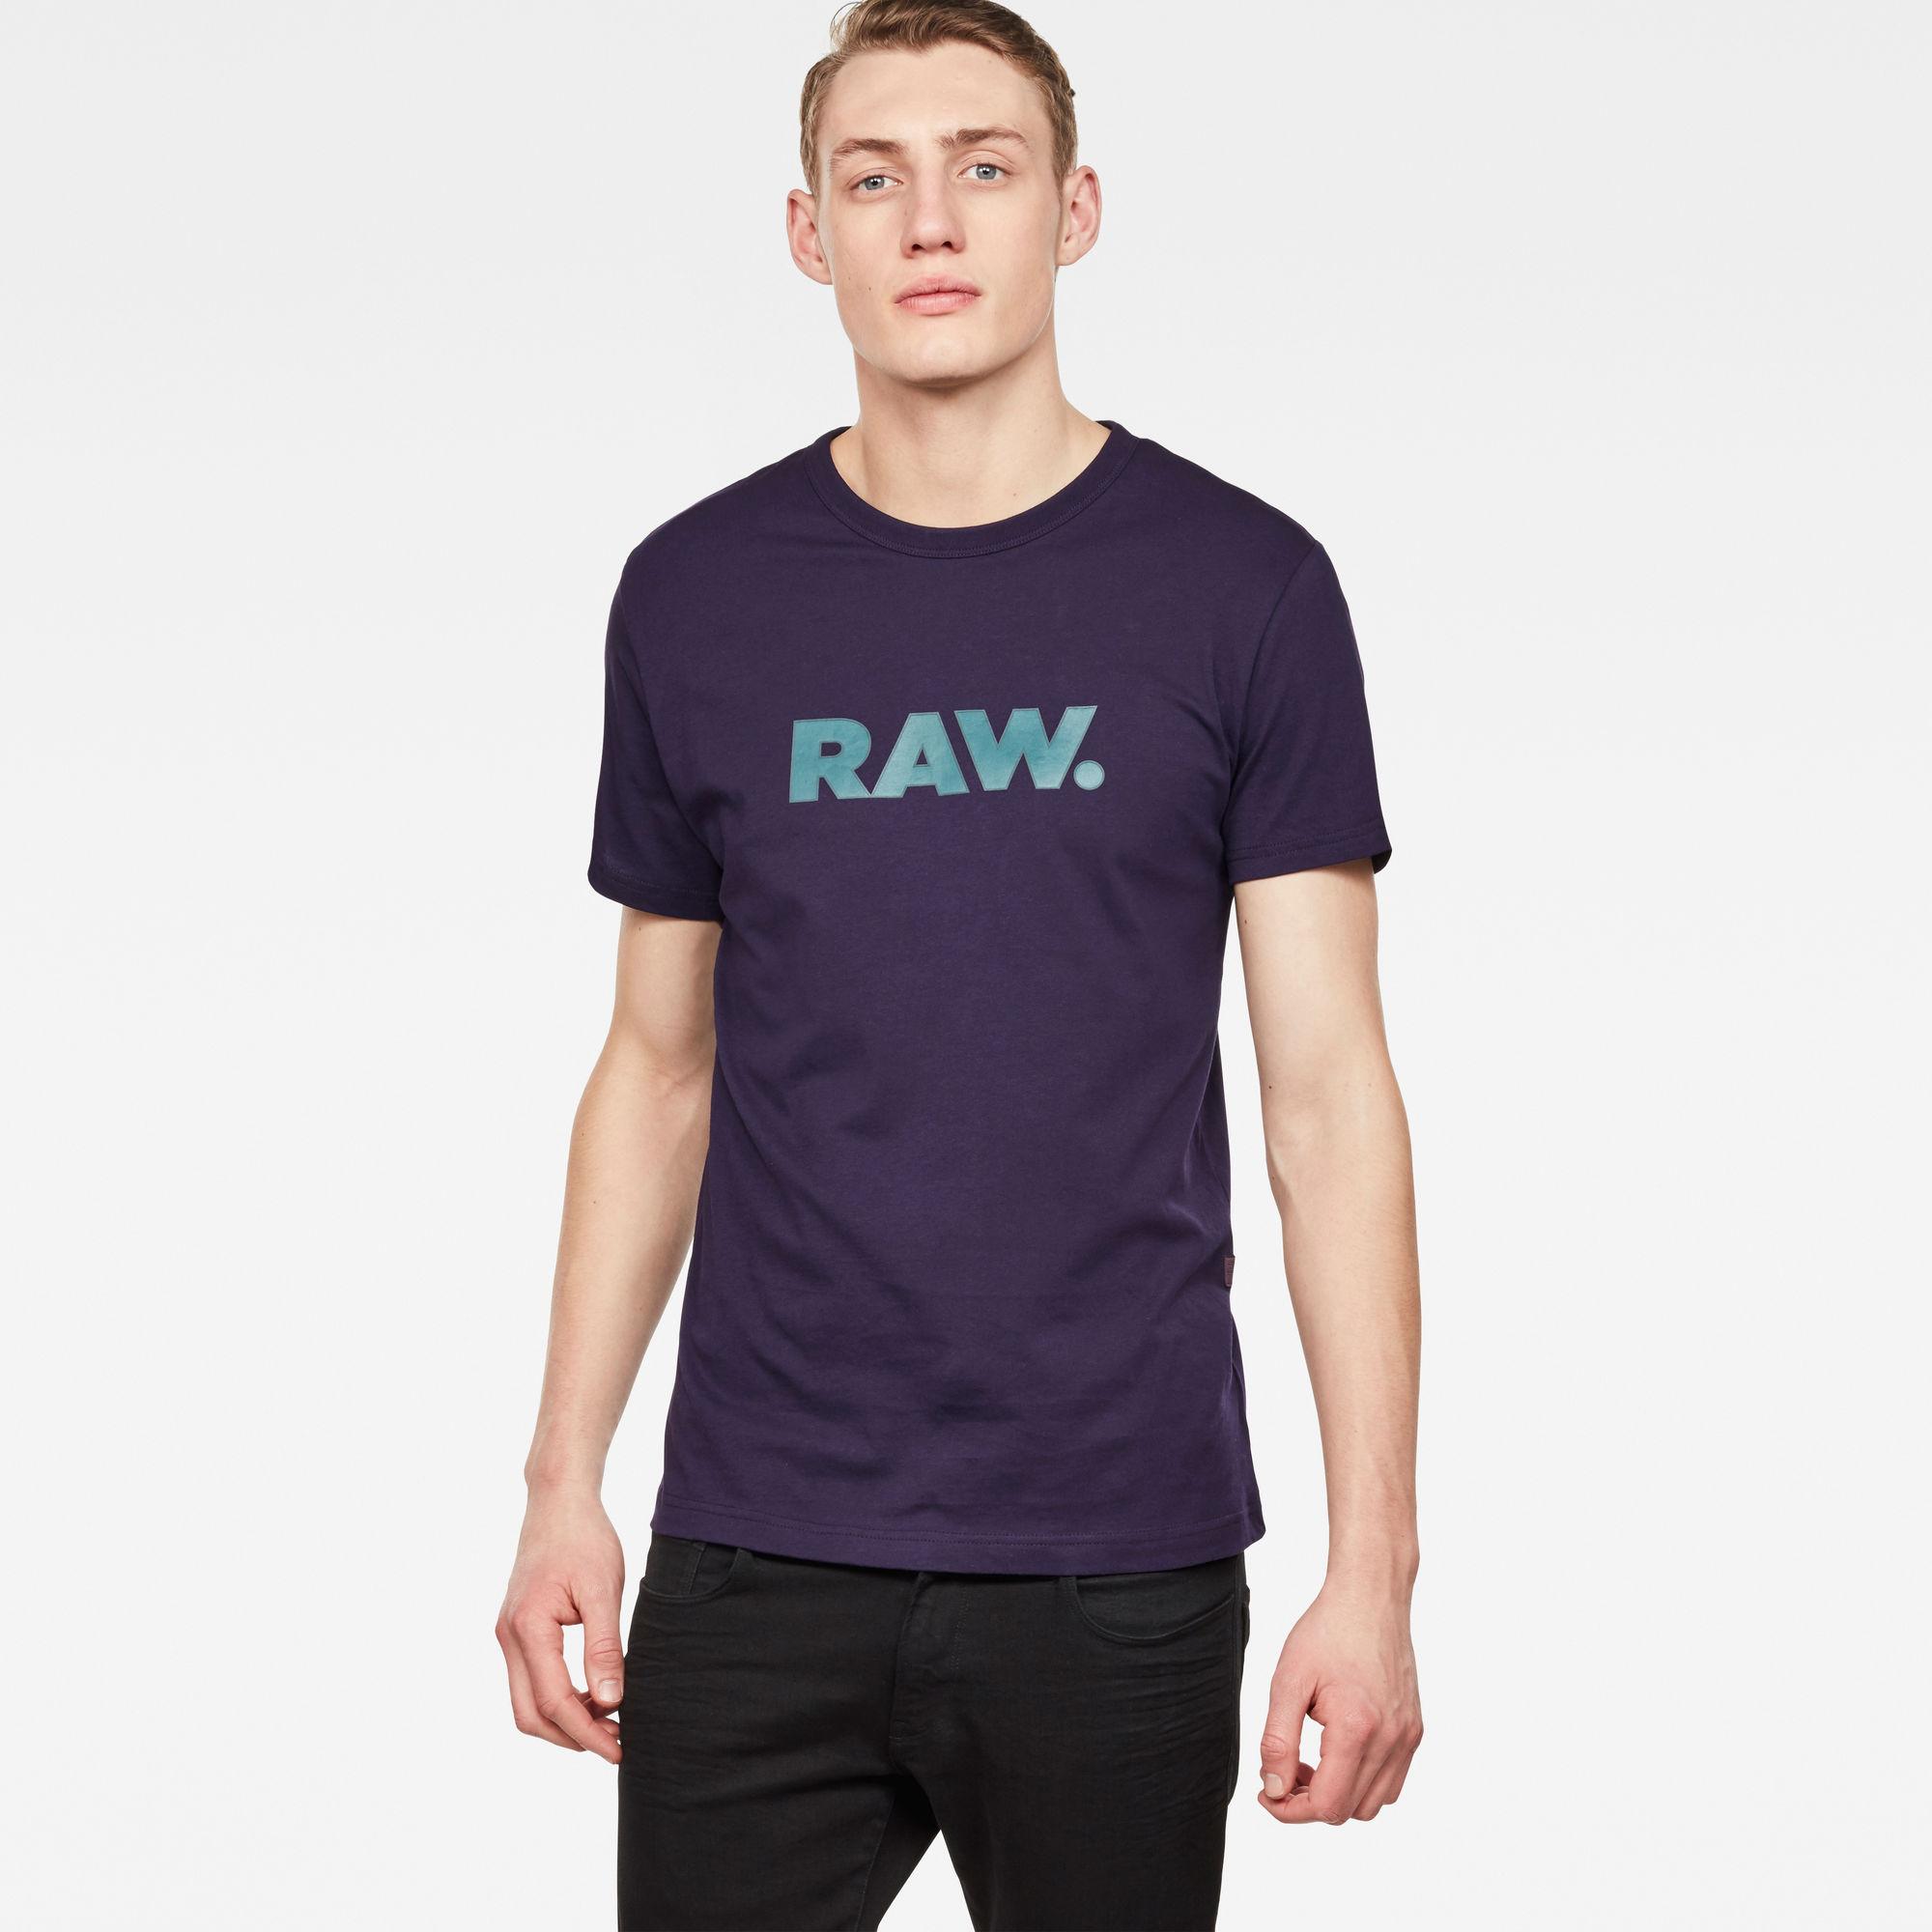 Xenoli t-shirt